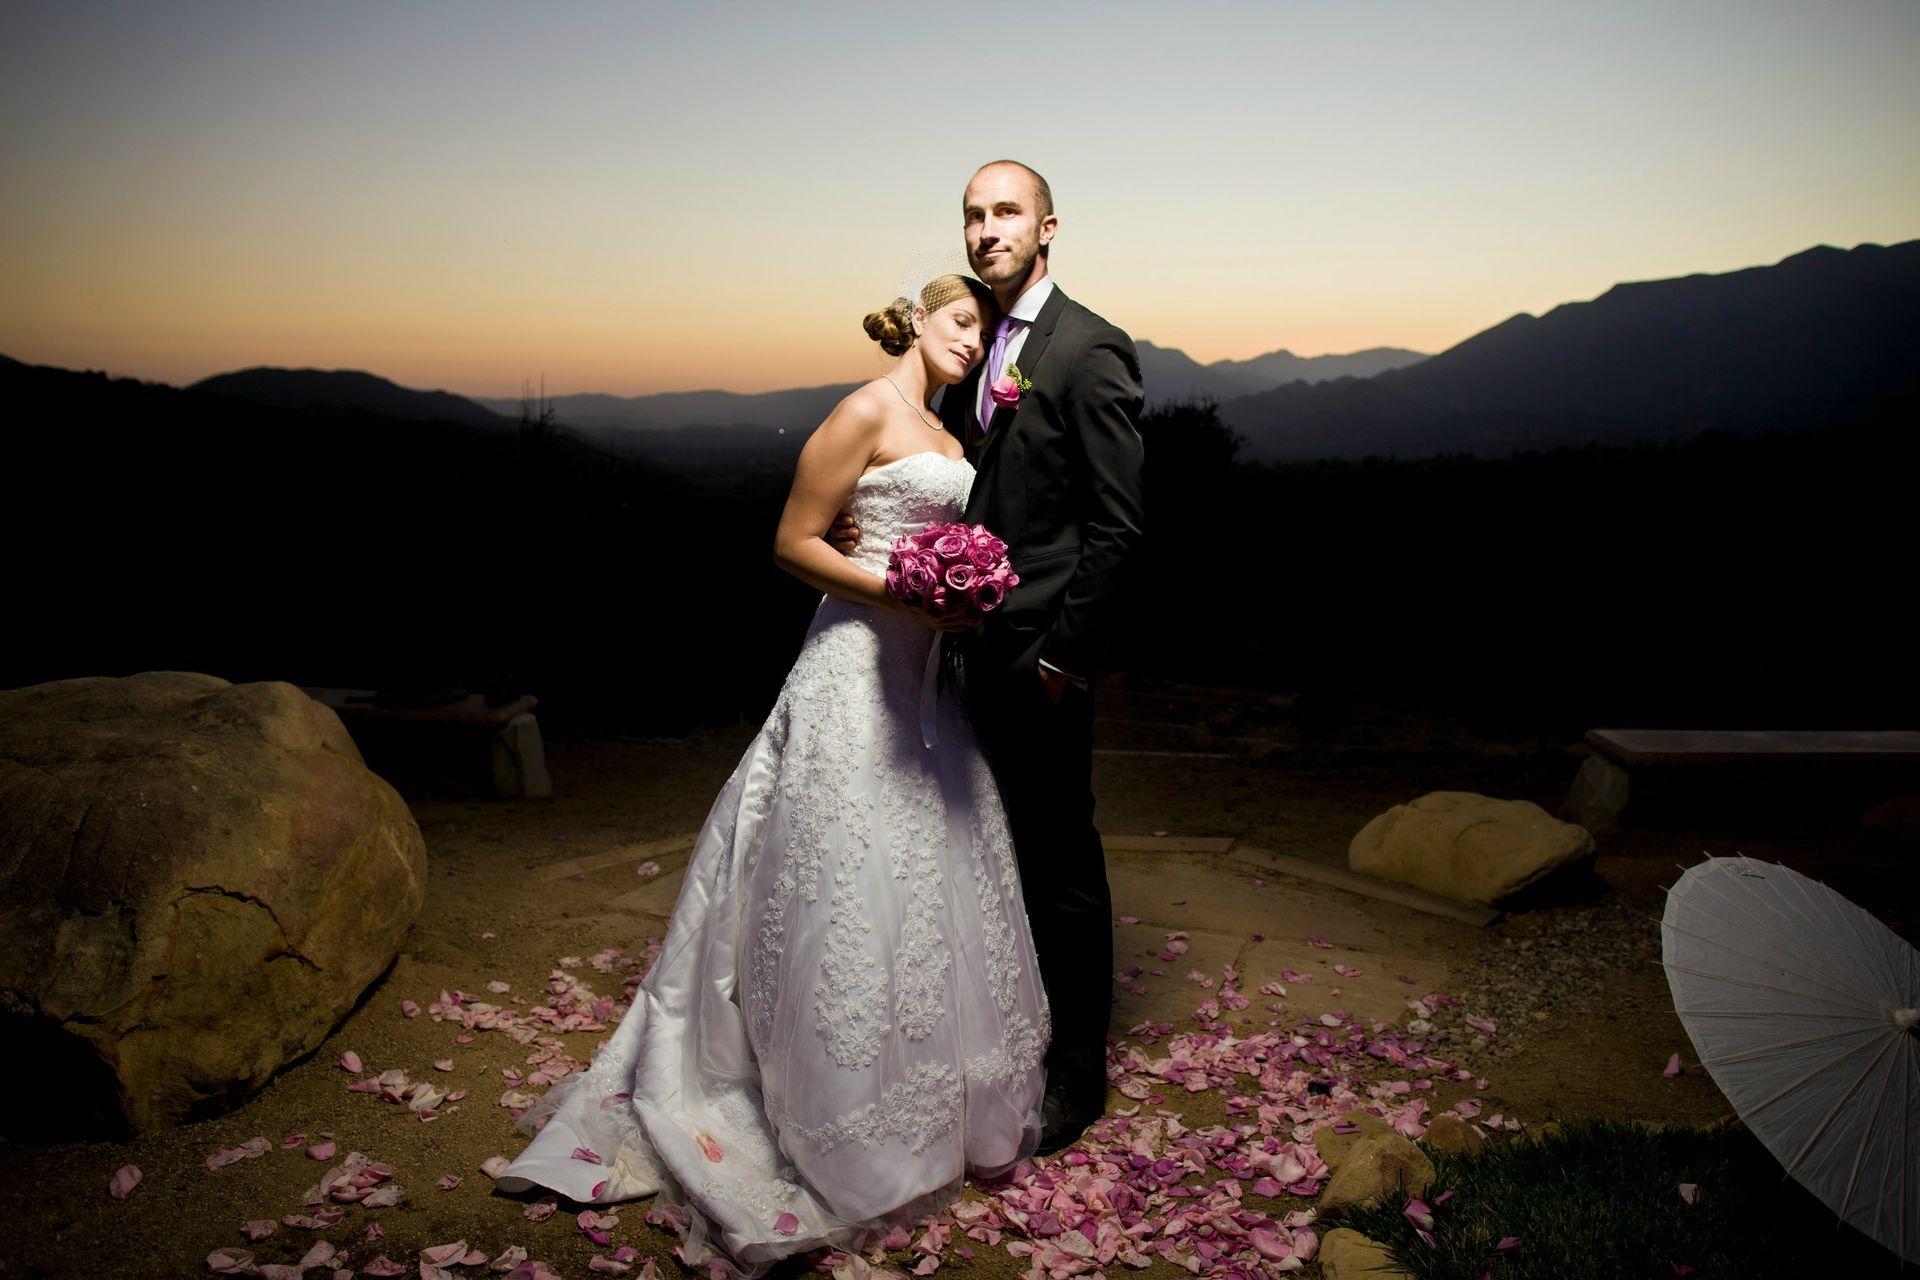 16-couple-wedding-portrait-couple